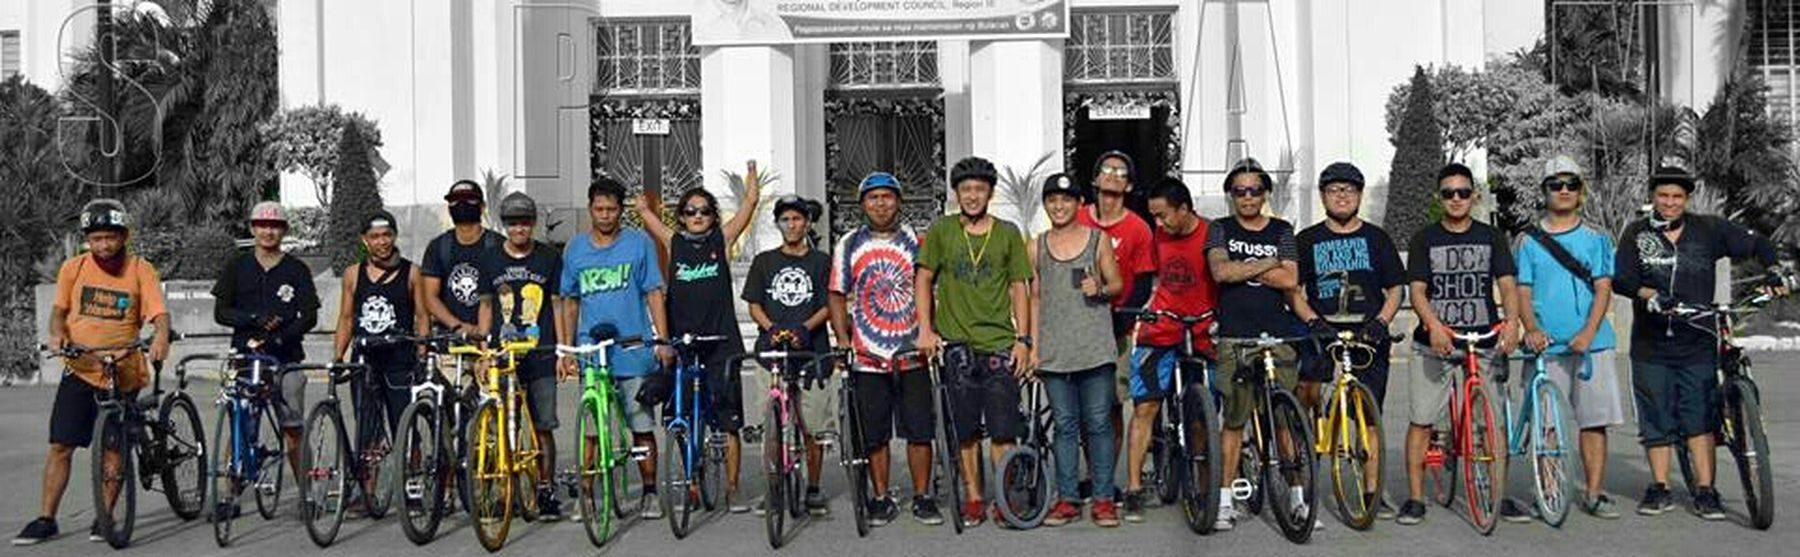 Fixedgear Fixedlife Nobreaks SpamRepresent. GobangPadjakAll. MTB Roadbike Foldingbike Family Philippineriders